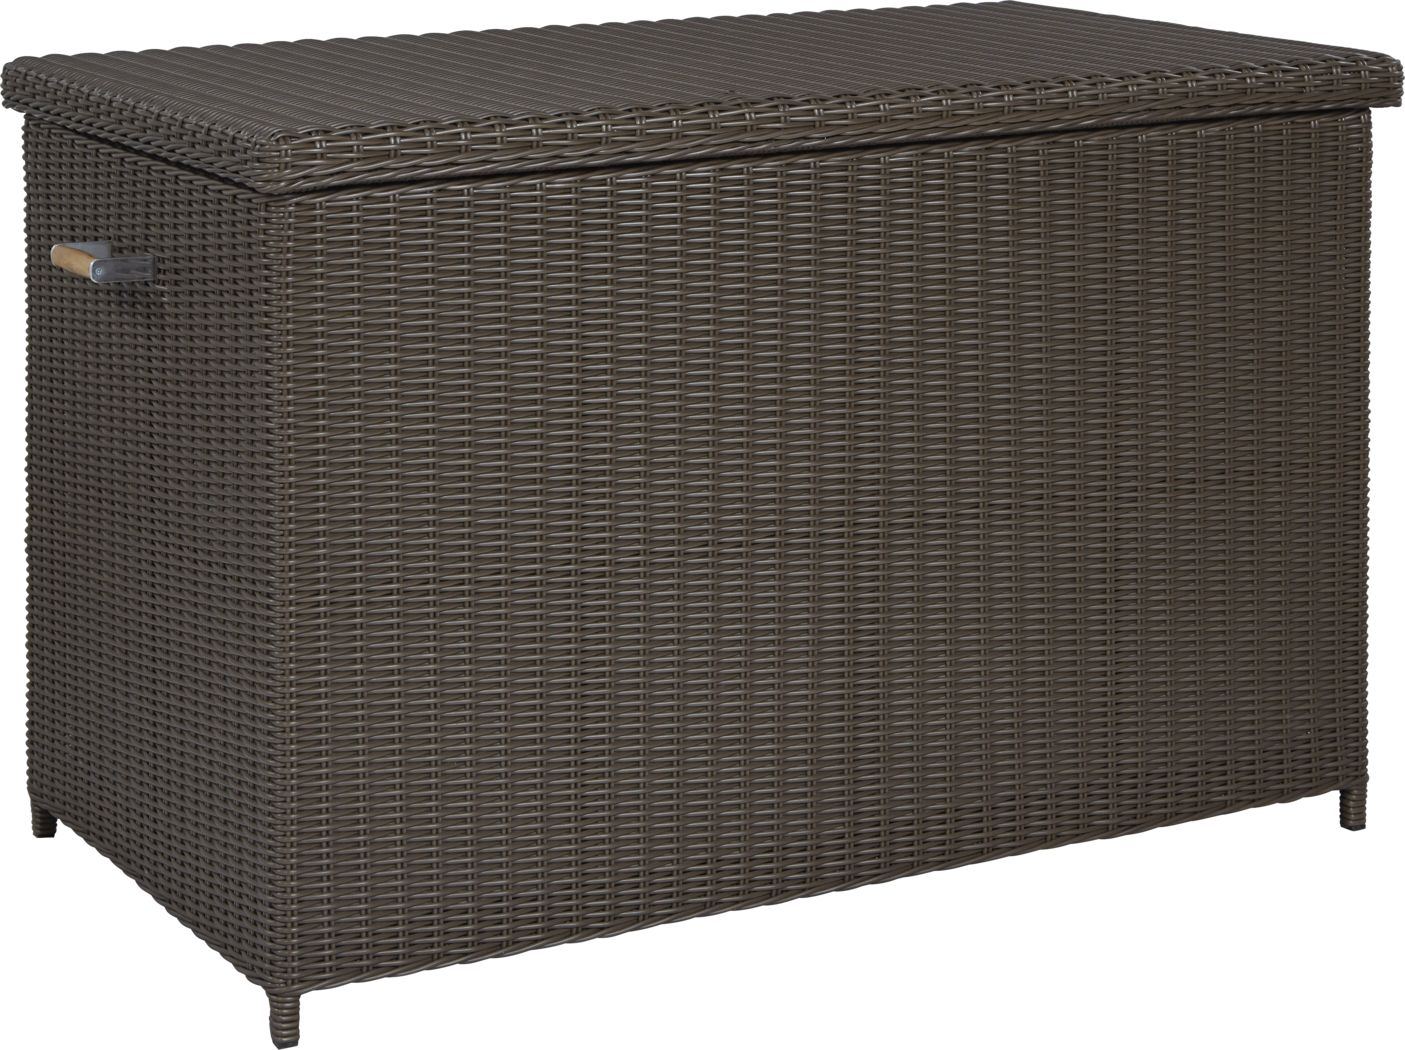 Patmos Brown Outdoor Cushion Storage Box